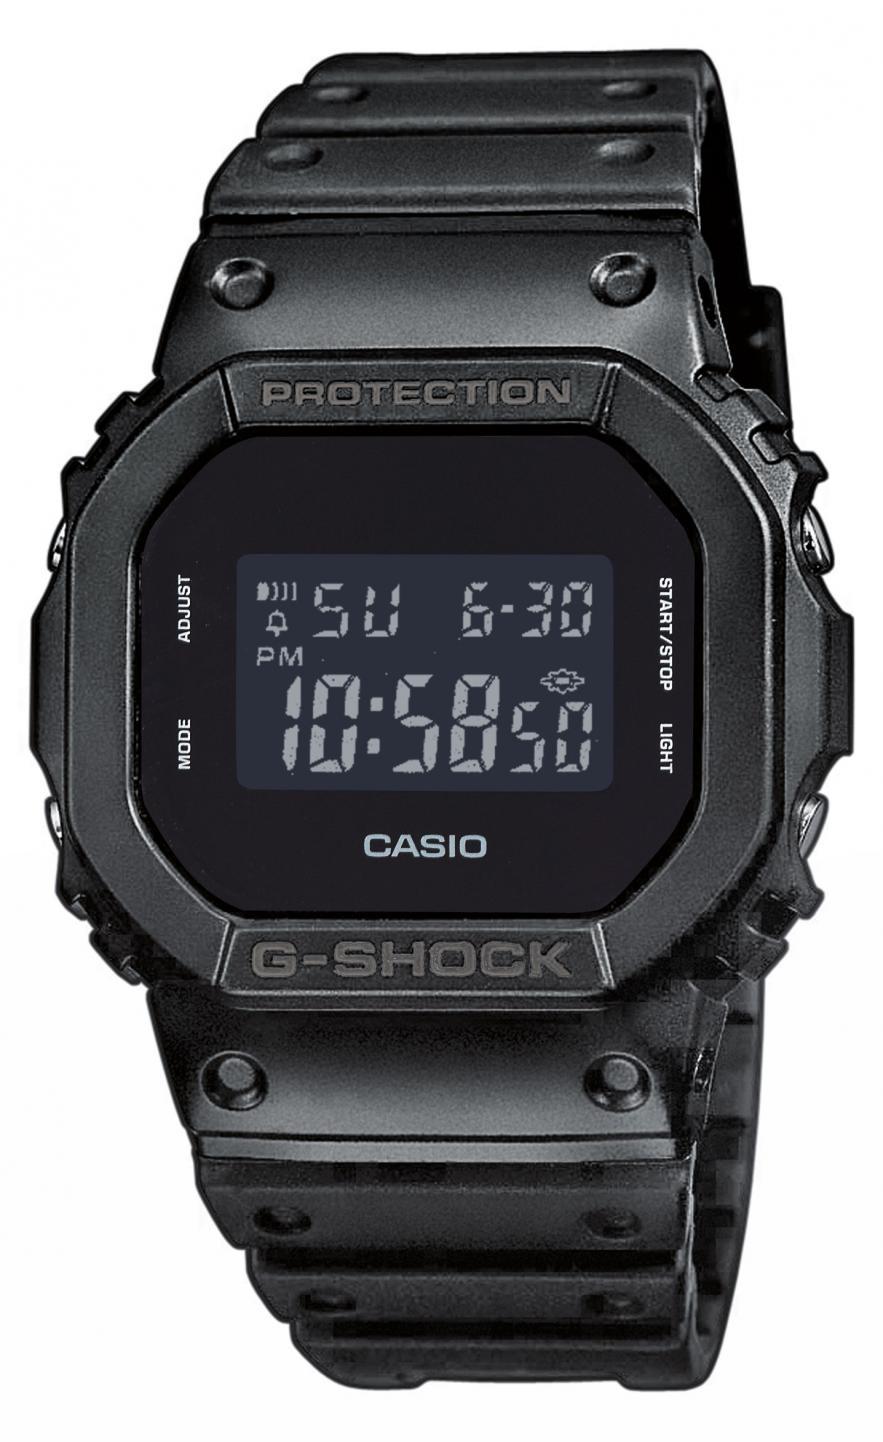 G-Shock DW-5600BB-1ER G-SHOCK Original